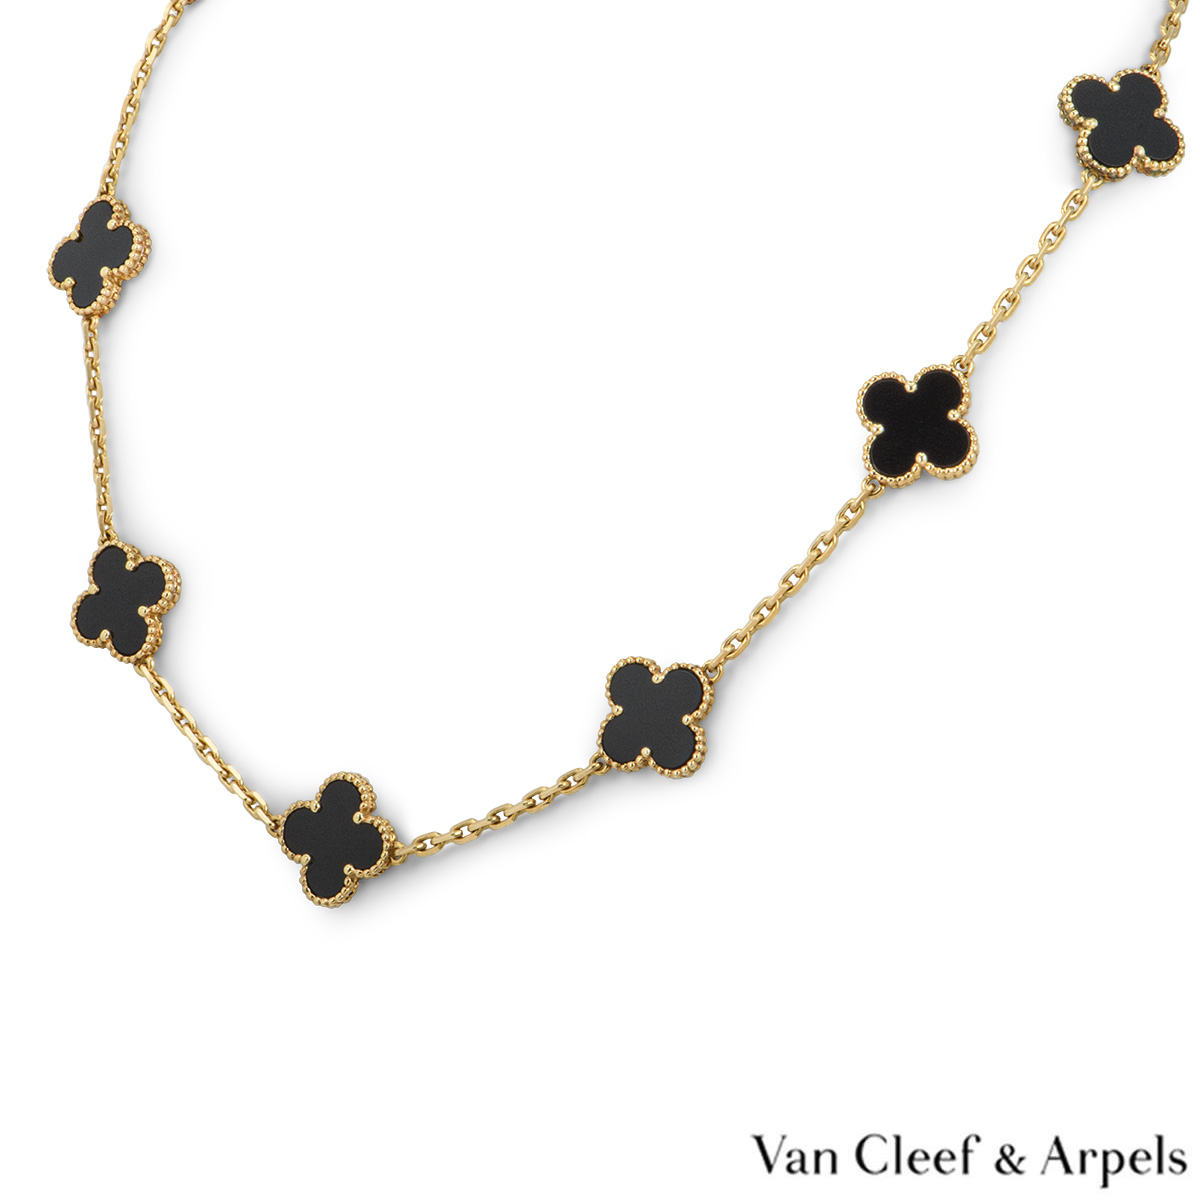 Van Cleef & Arpels Yellow Gold Onyx Vintage Alhambra Necklace VCARA42700